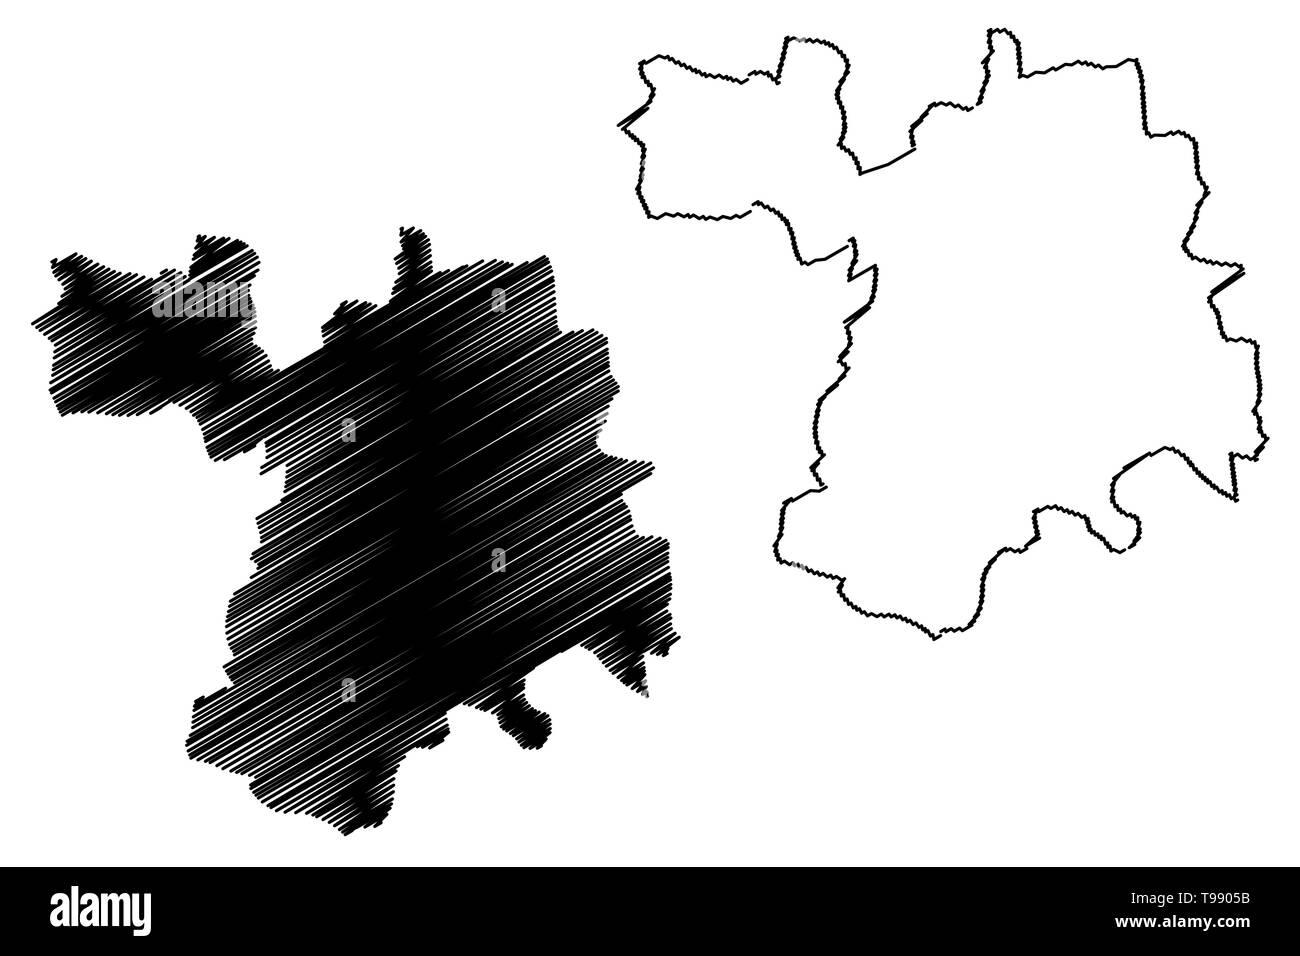 Setif Province (Provinces of Algeria, Peoples Democratic Republic of Algeria) map vector illustration, scribble sketch Setif map - Stock Image